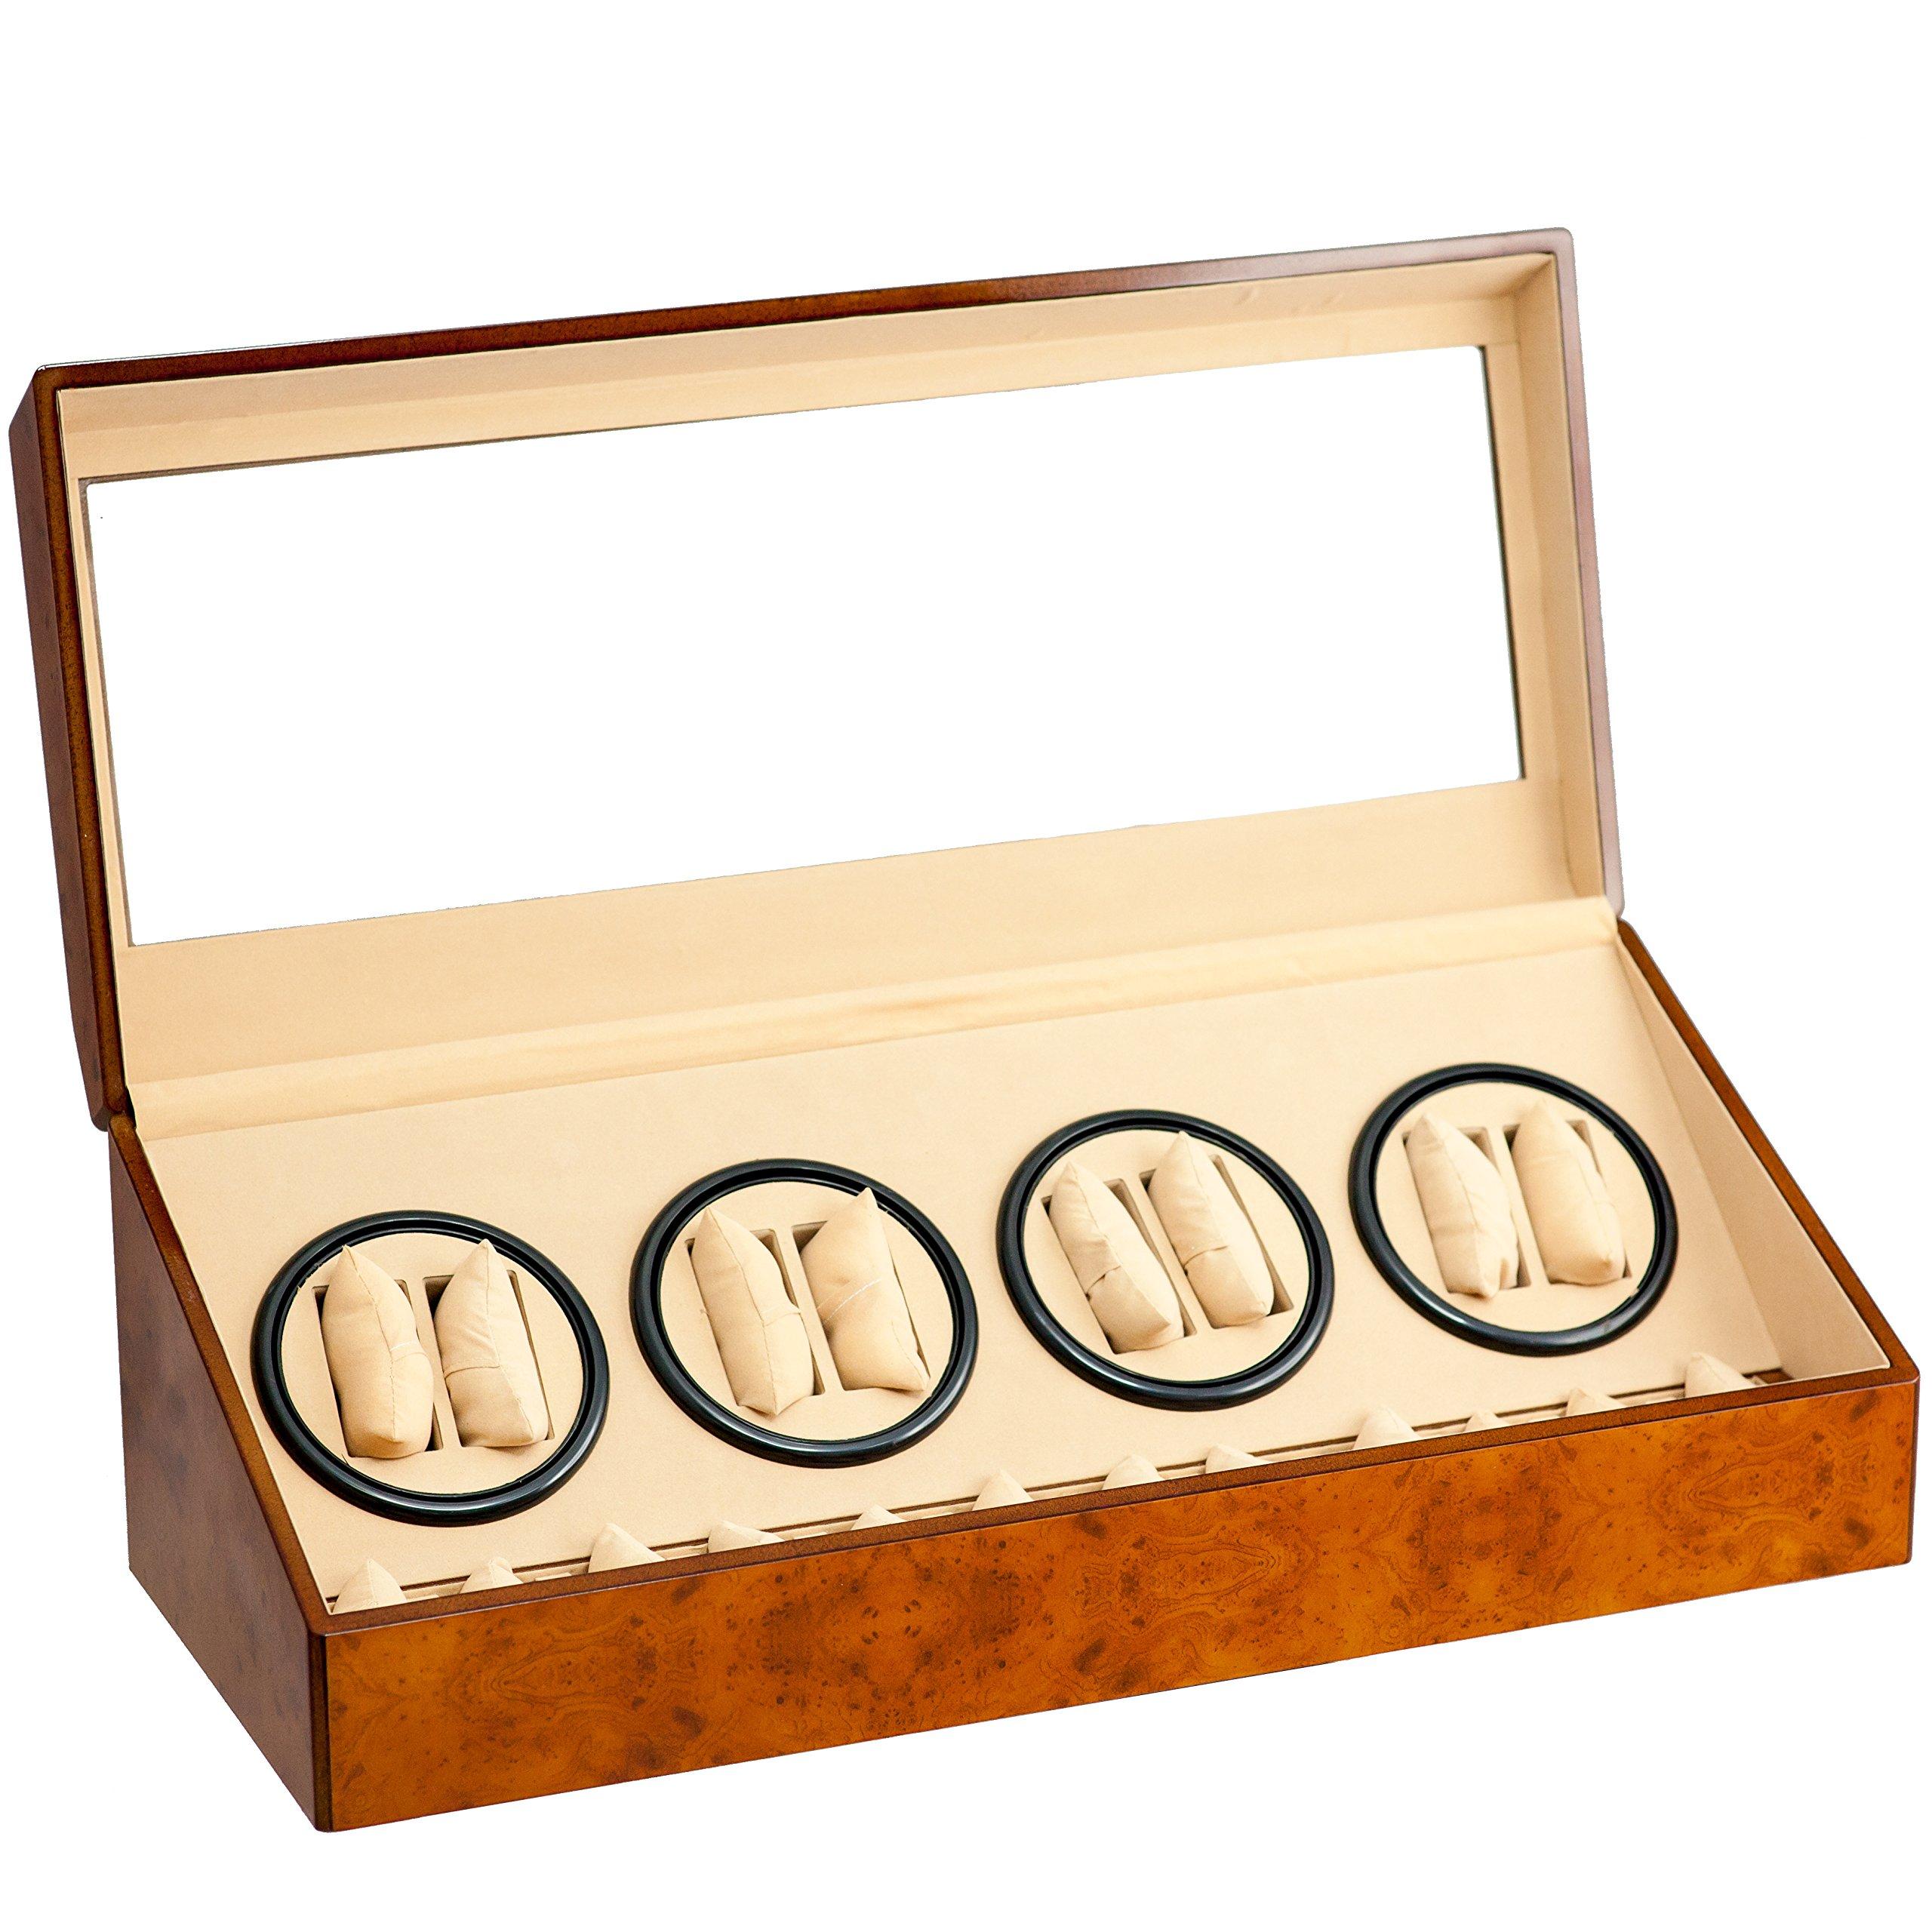 Brand New 8+12 Automatic Rotation Walnut Quad Watch Winder Storage Display Case Box Organizers